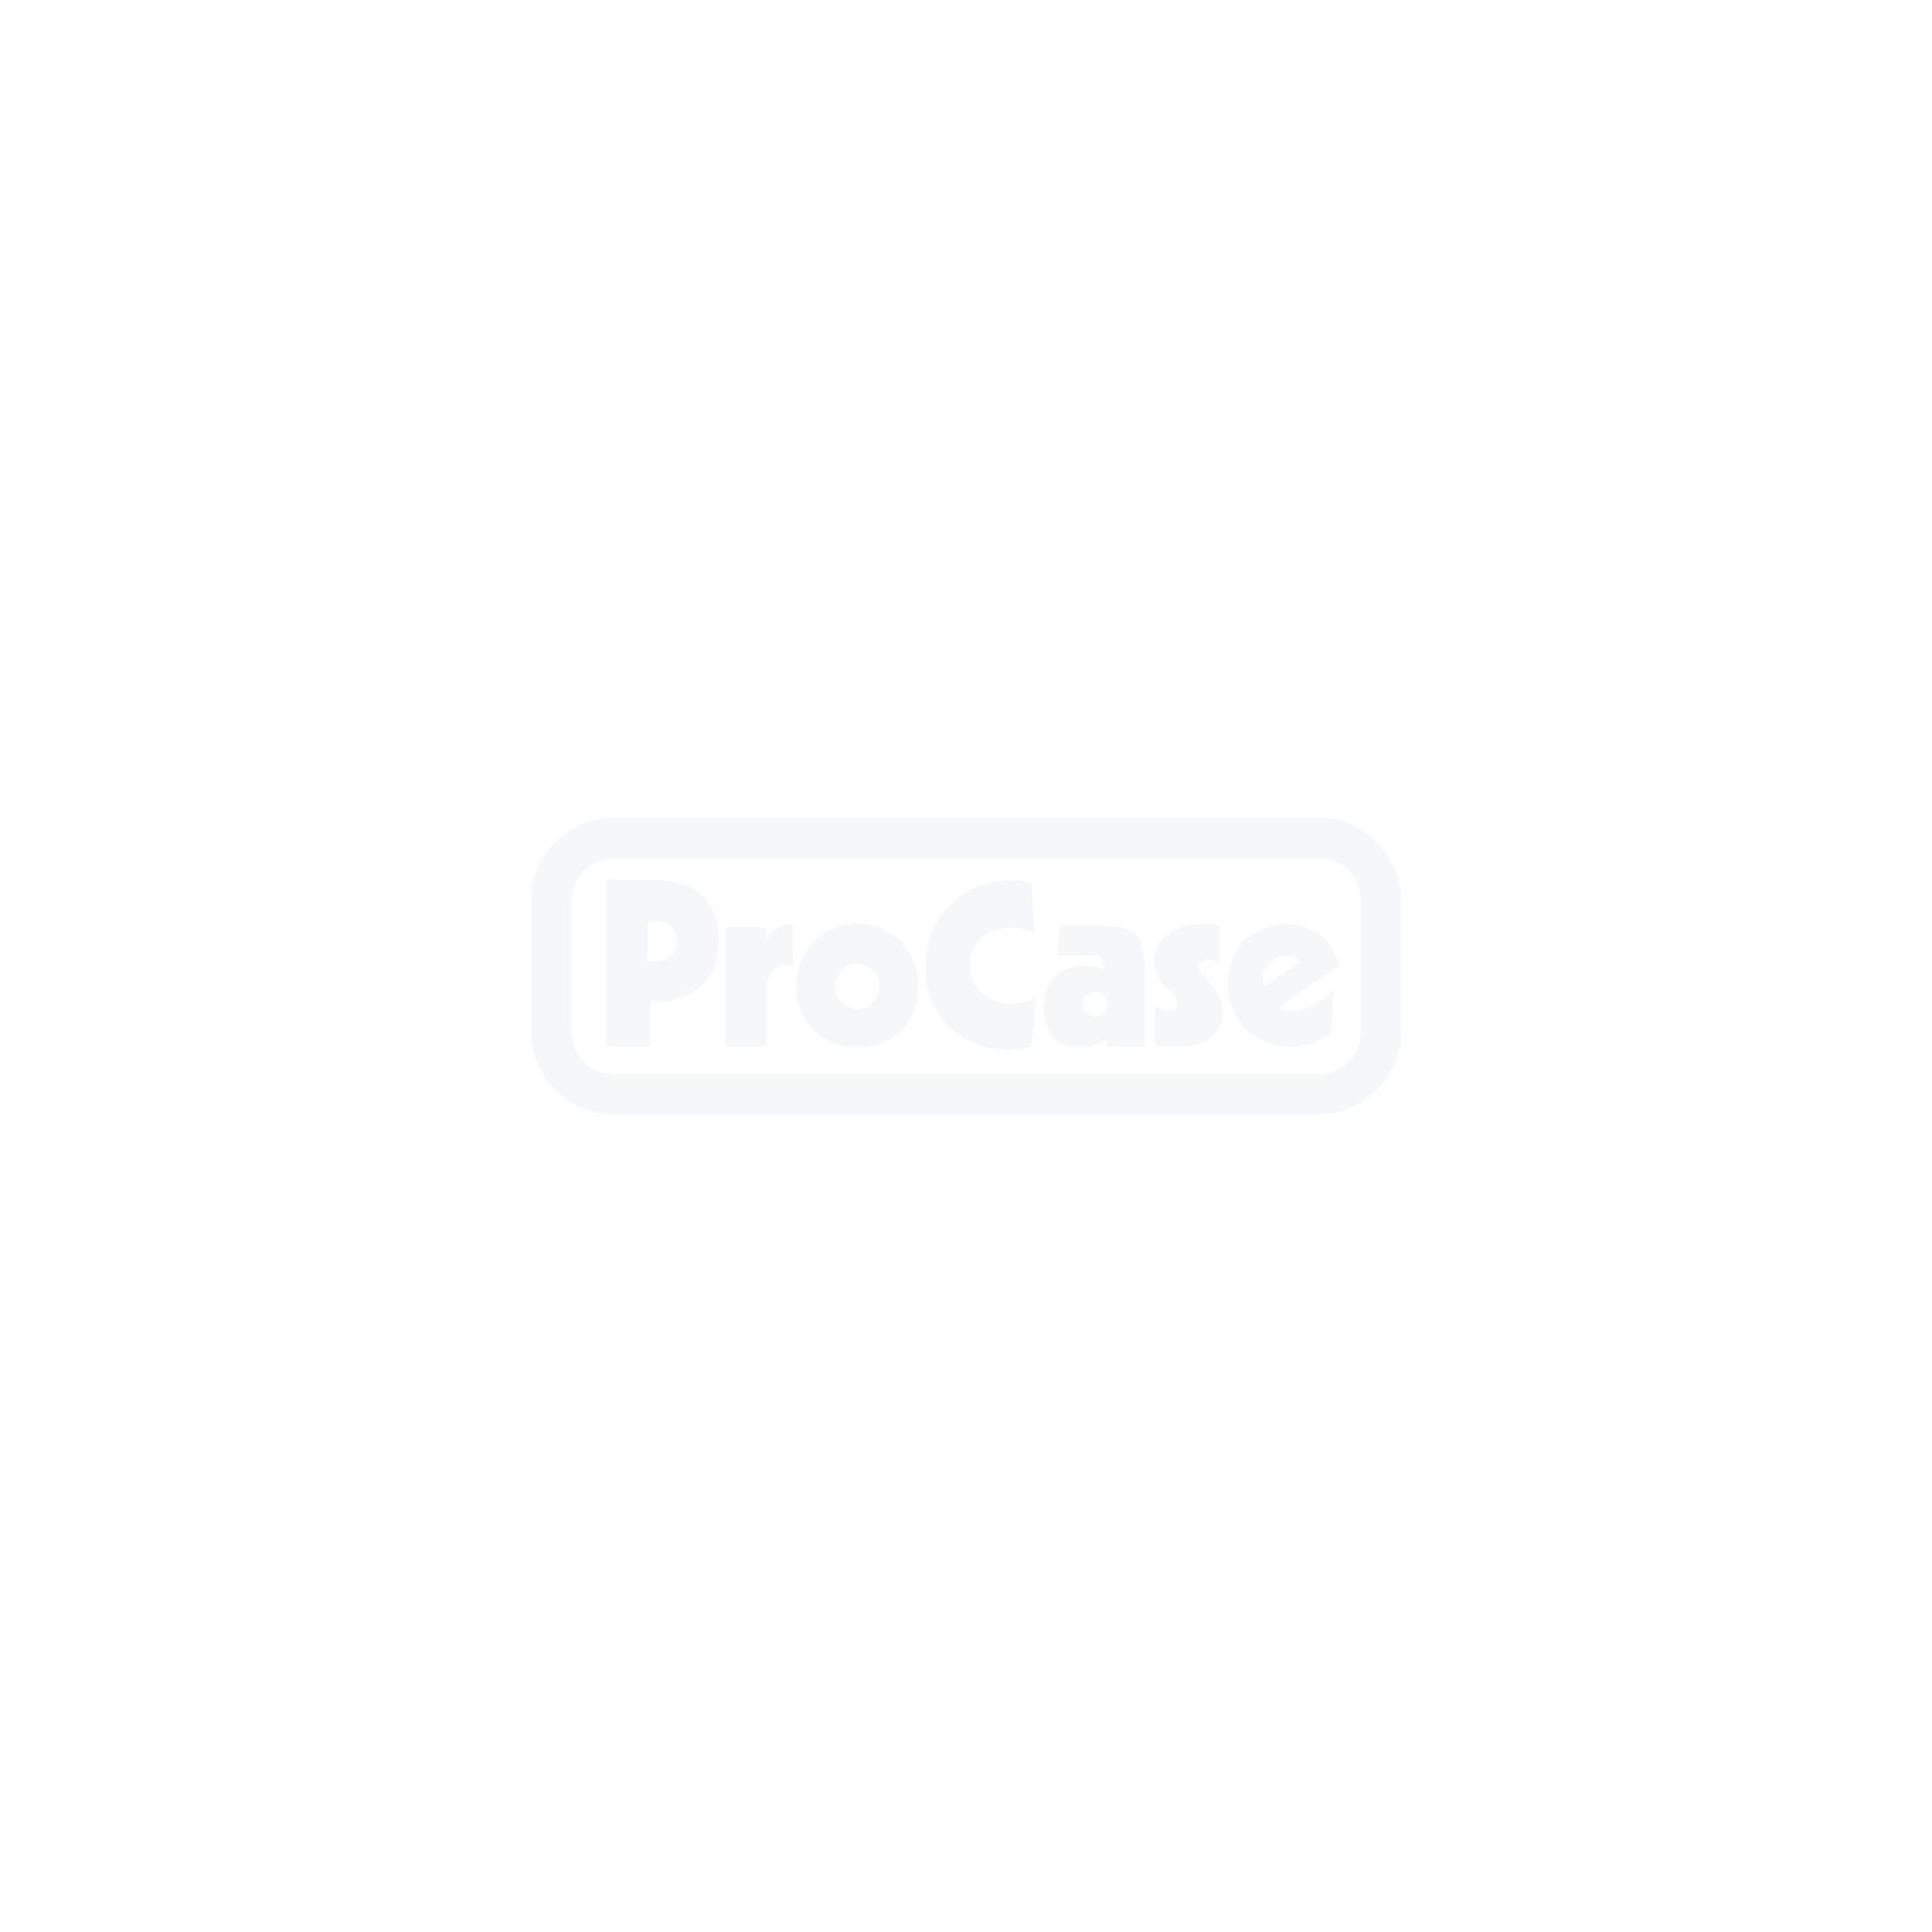 Flightcase für 4x Major 2-Cell Blinder 2